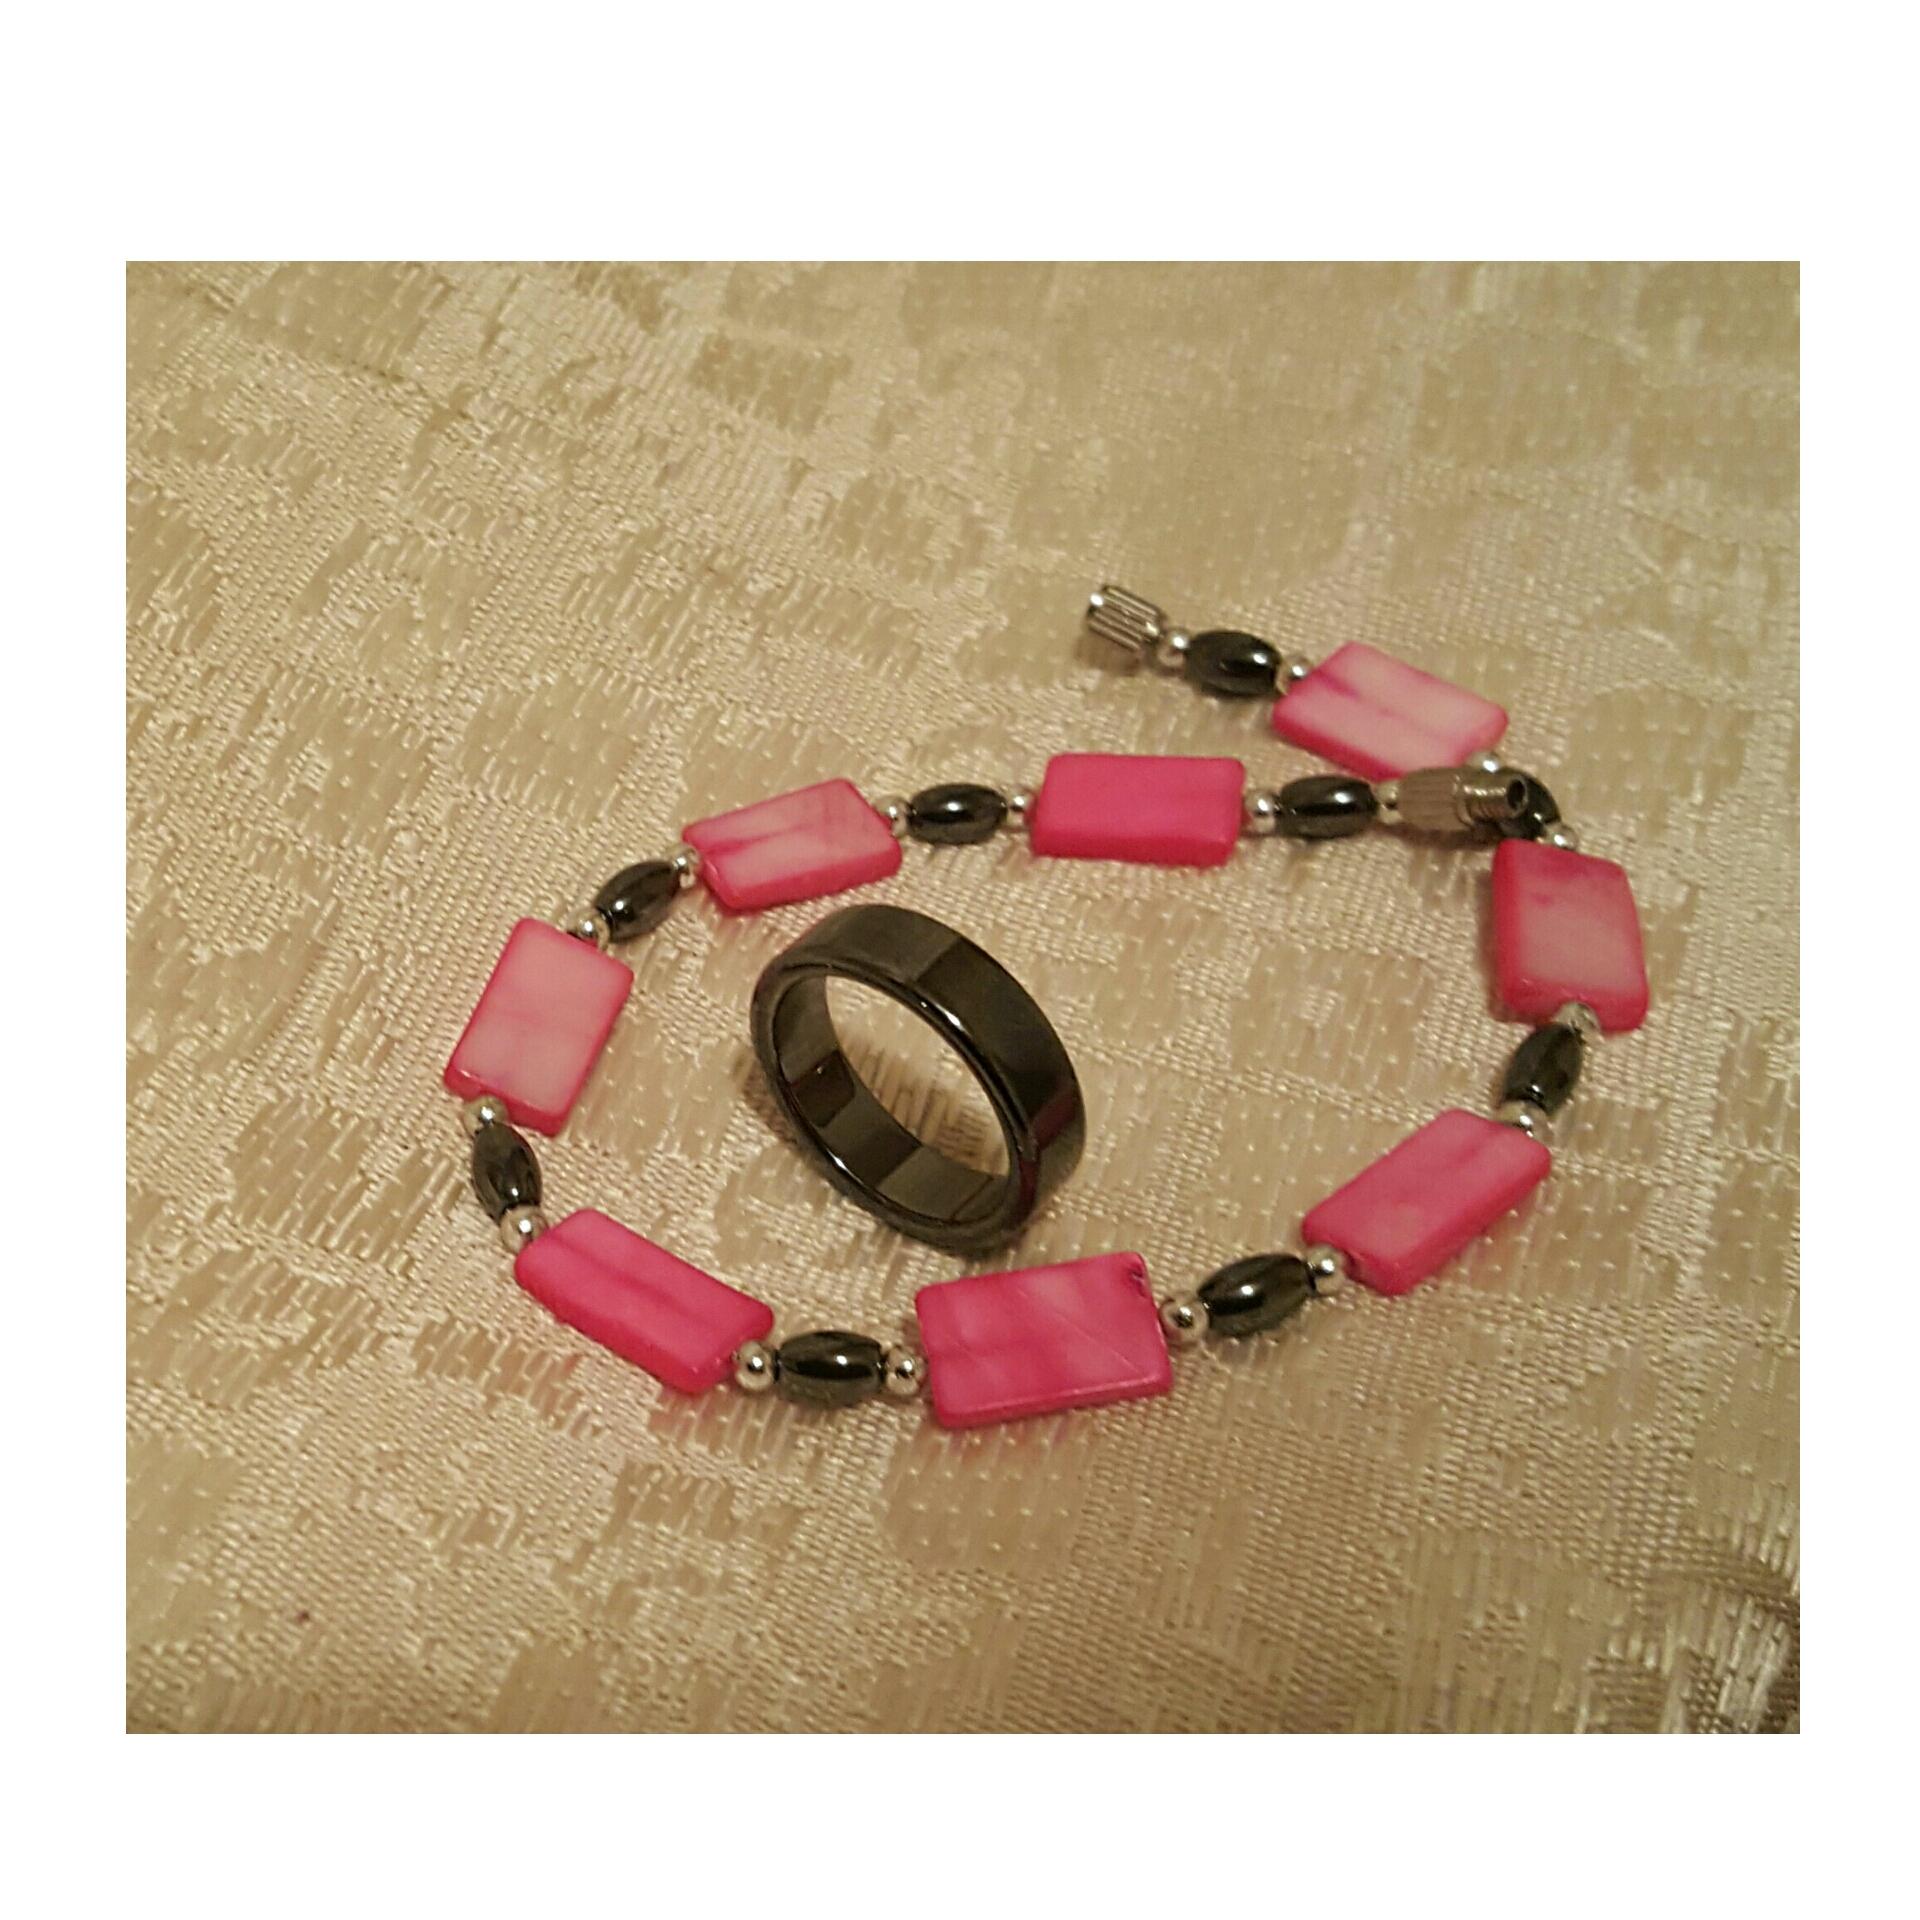 Polished Lava Stoned Ring & Bracelet - Isle of Dominica